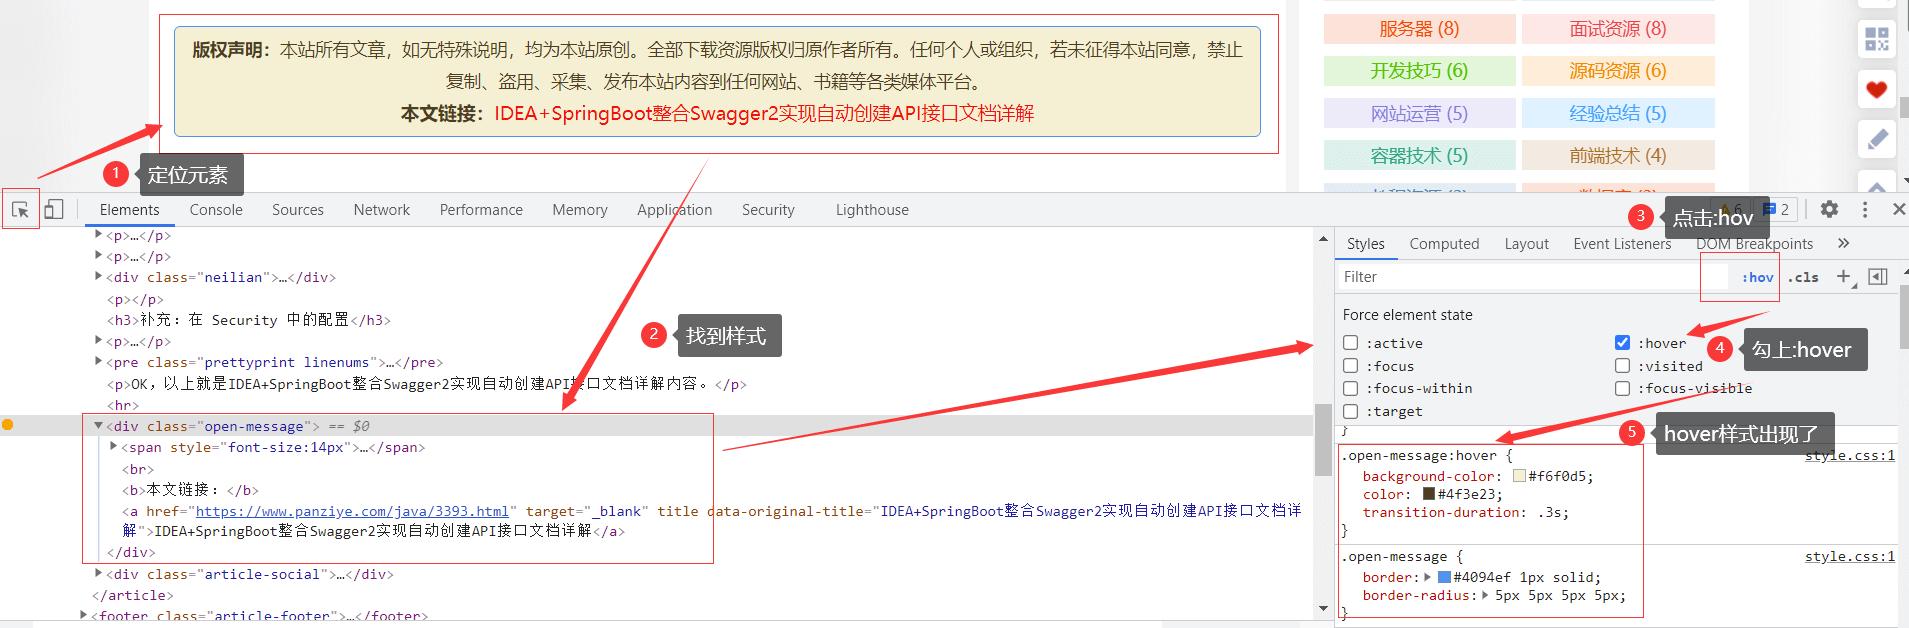 chrome浏览器如何审查hover元素的css样式